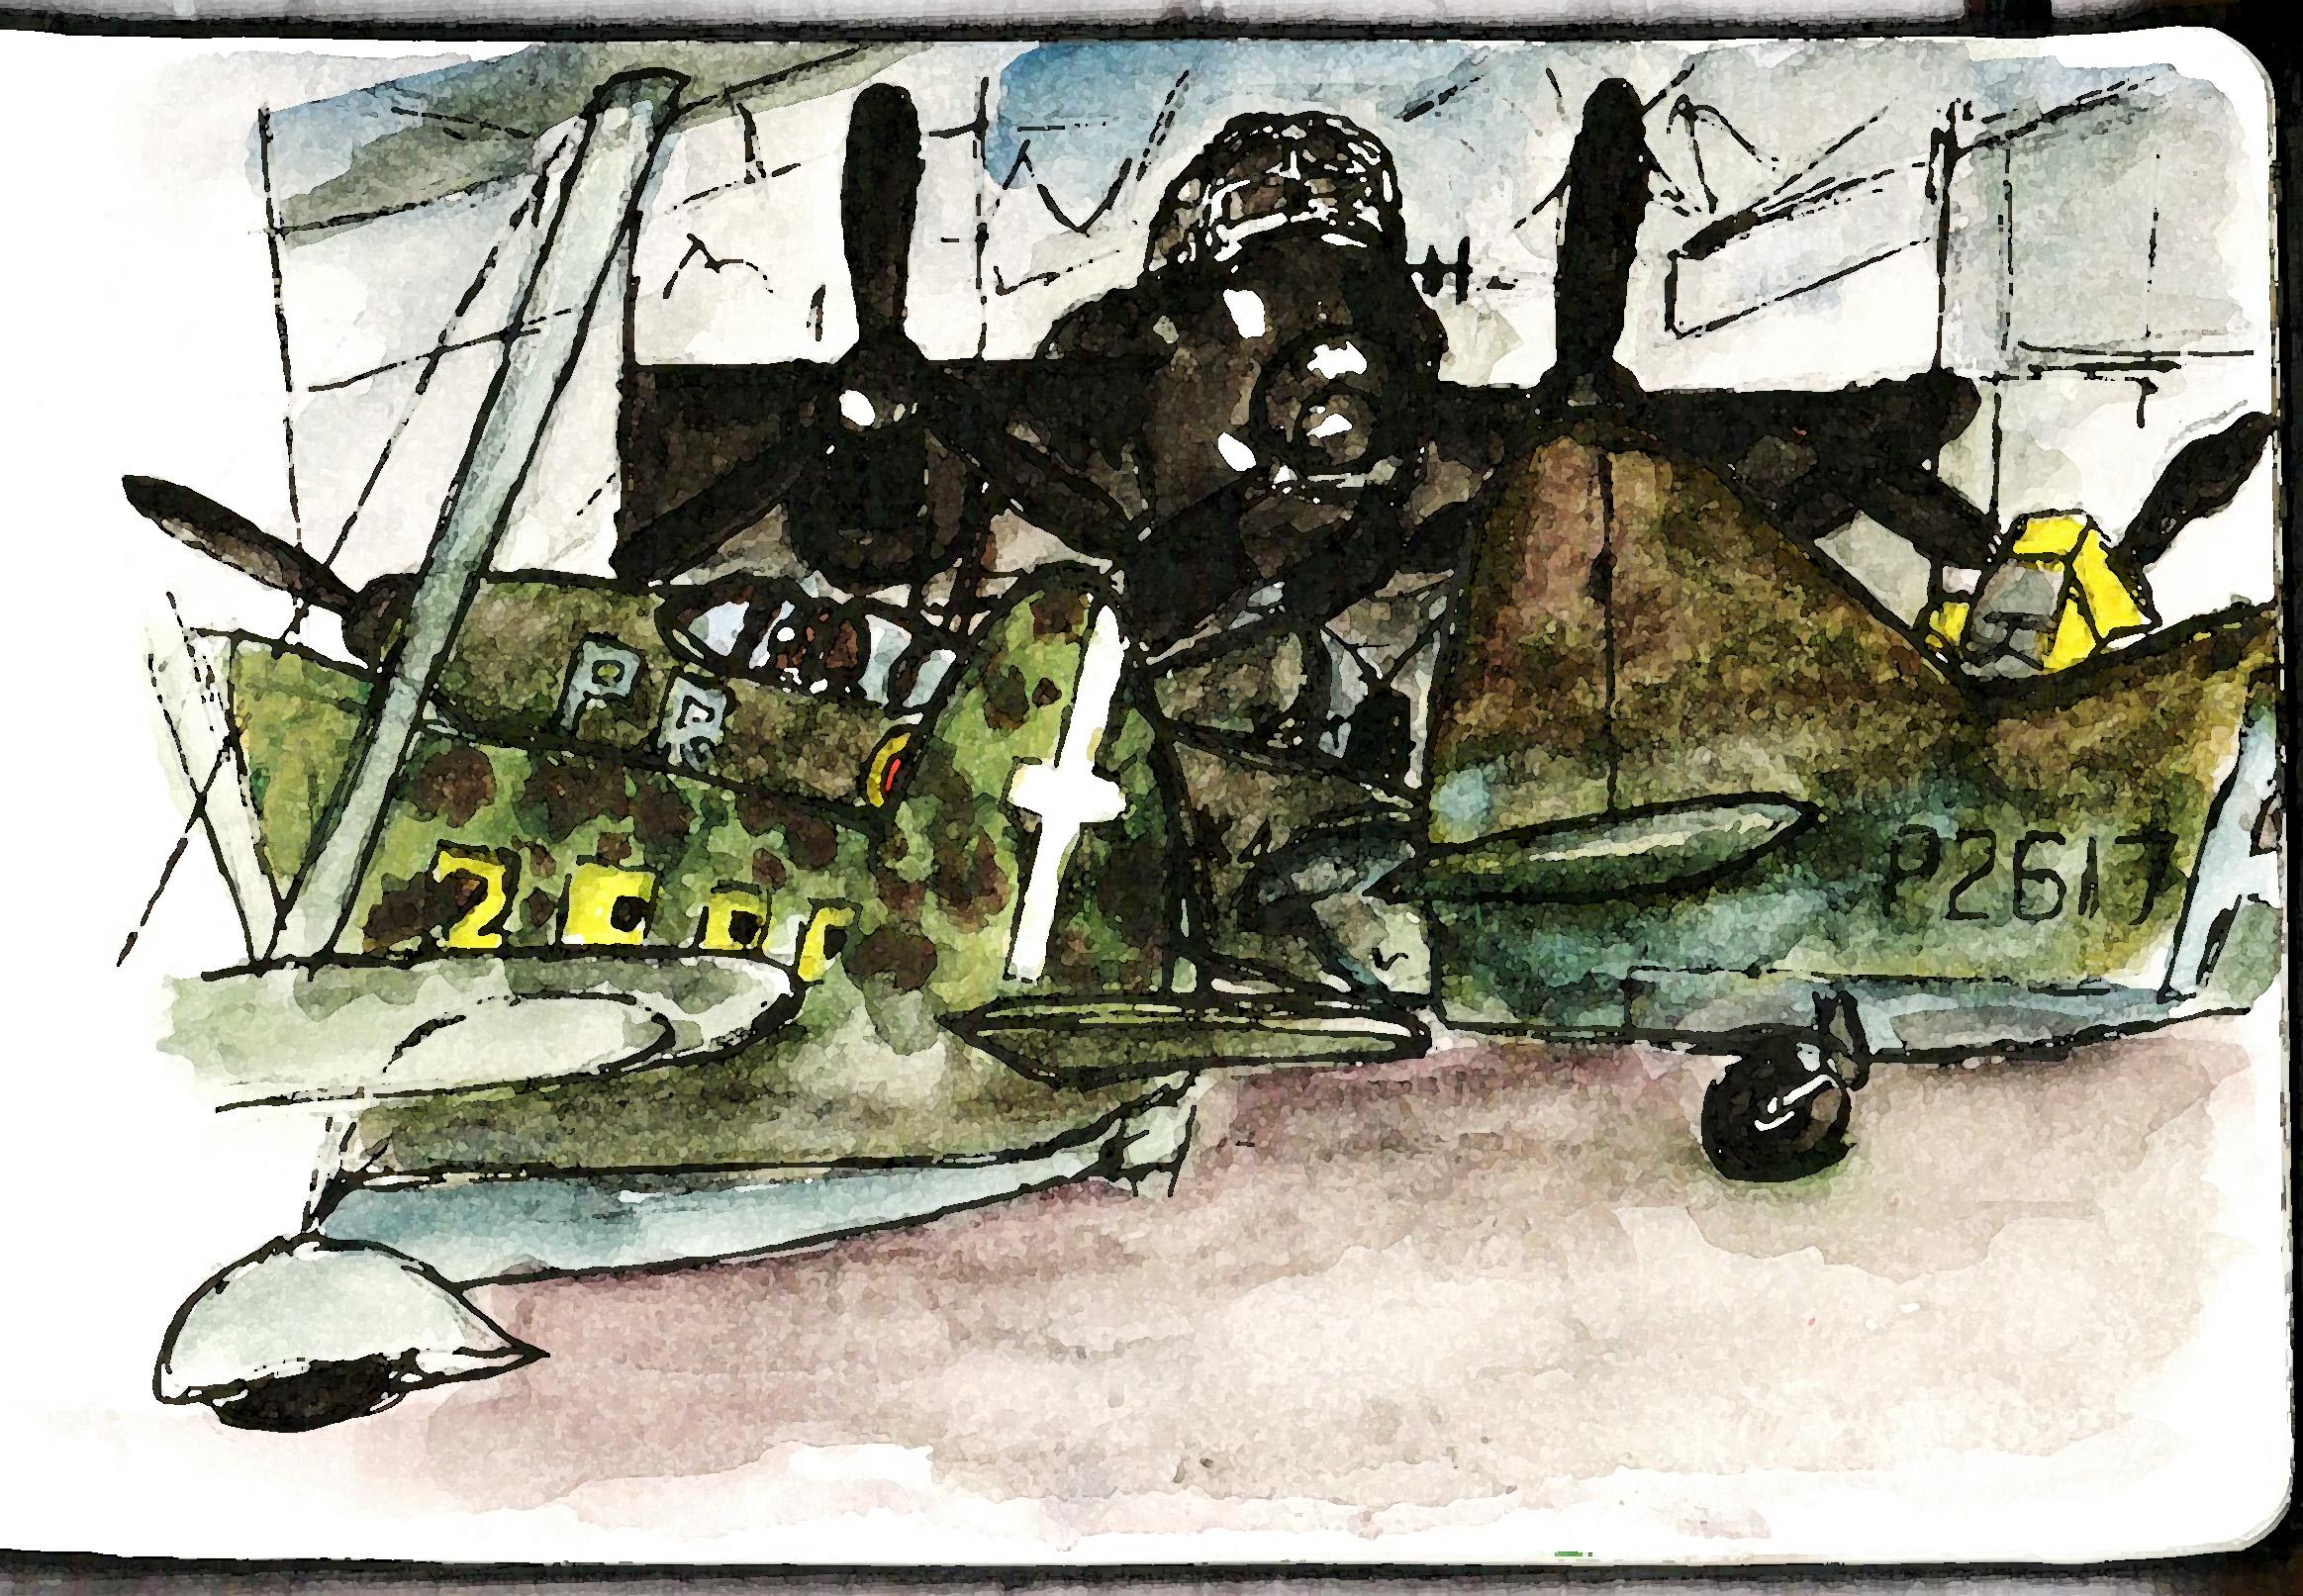 RAF Hendon - a snap sketch